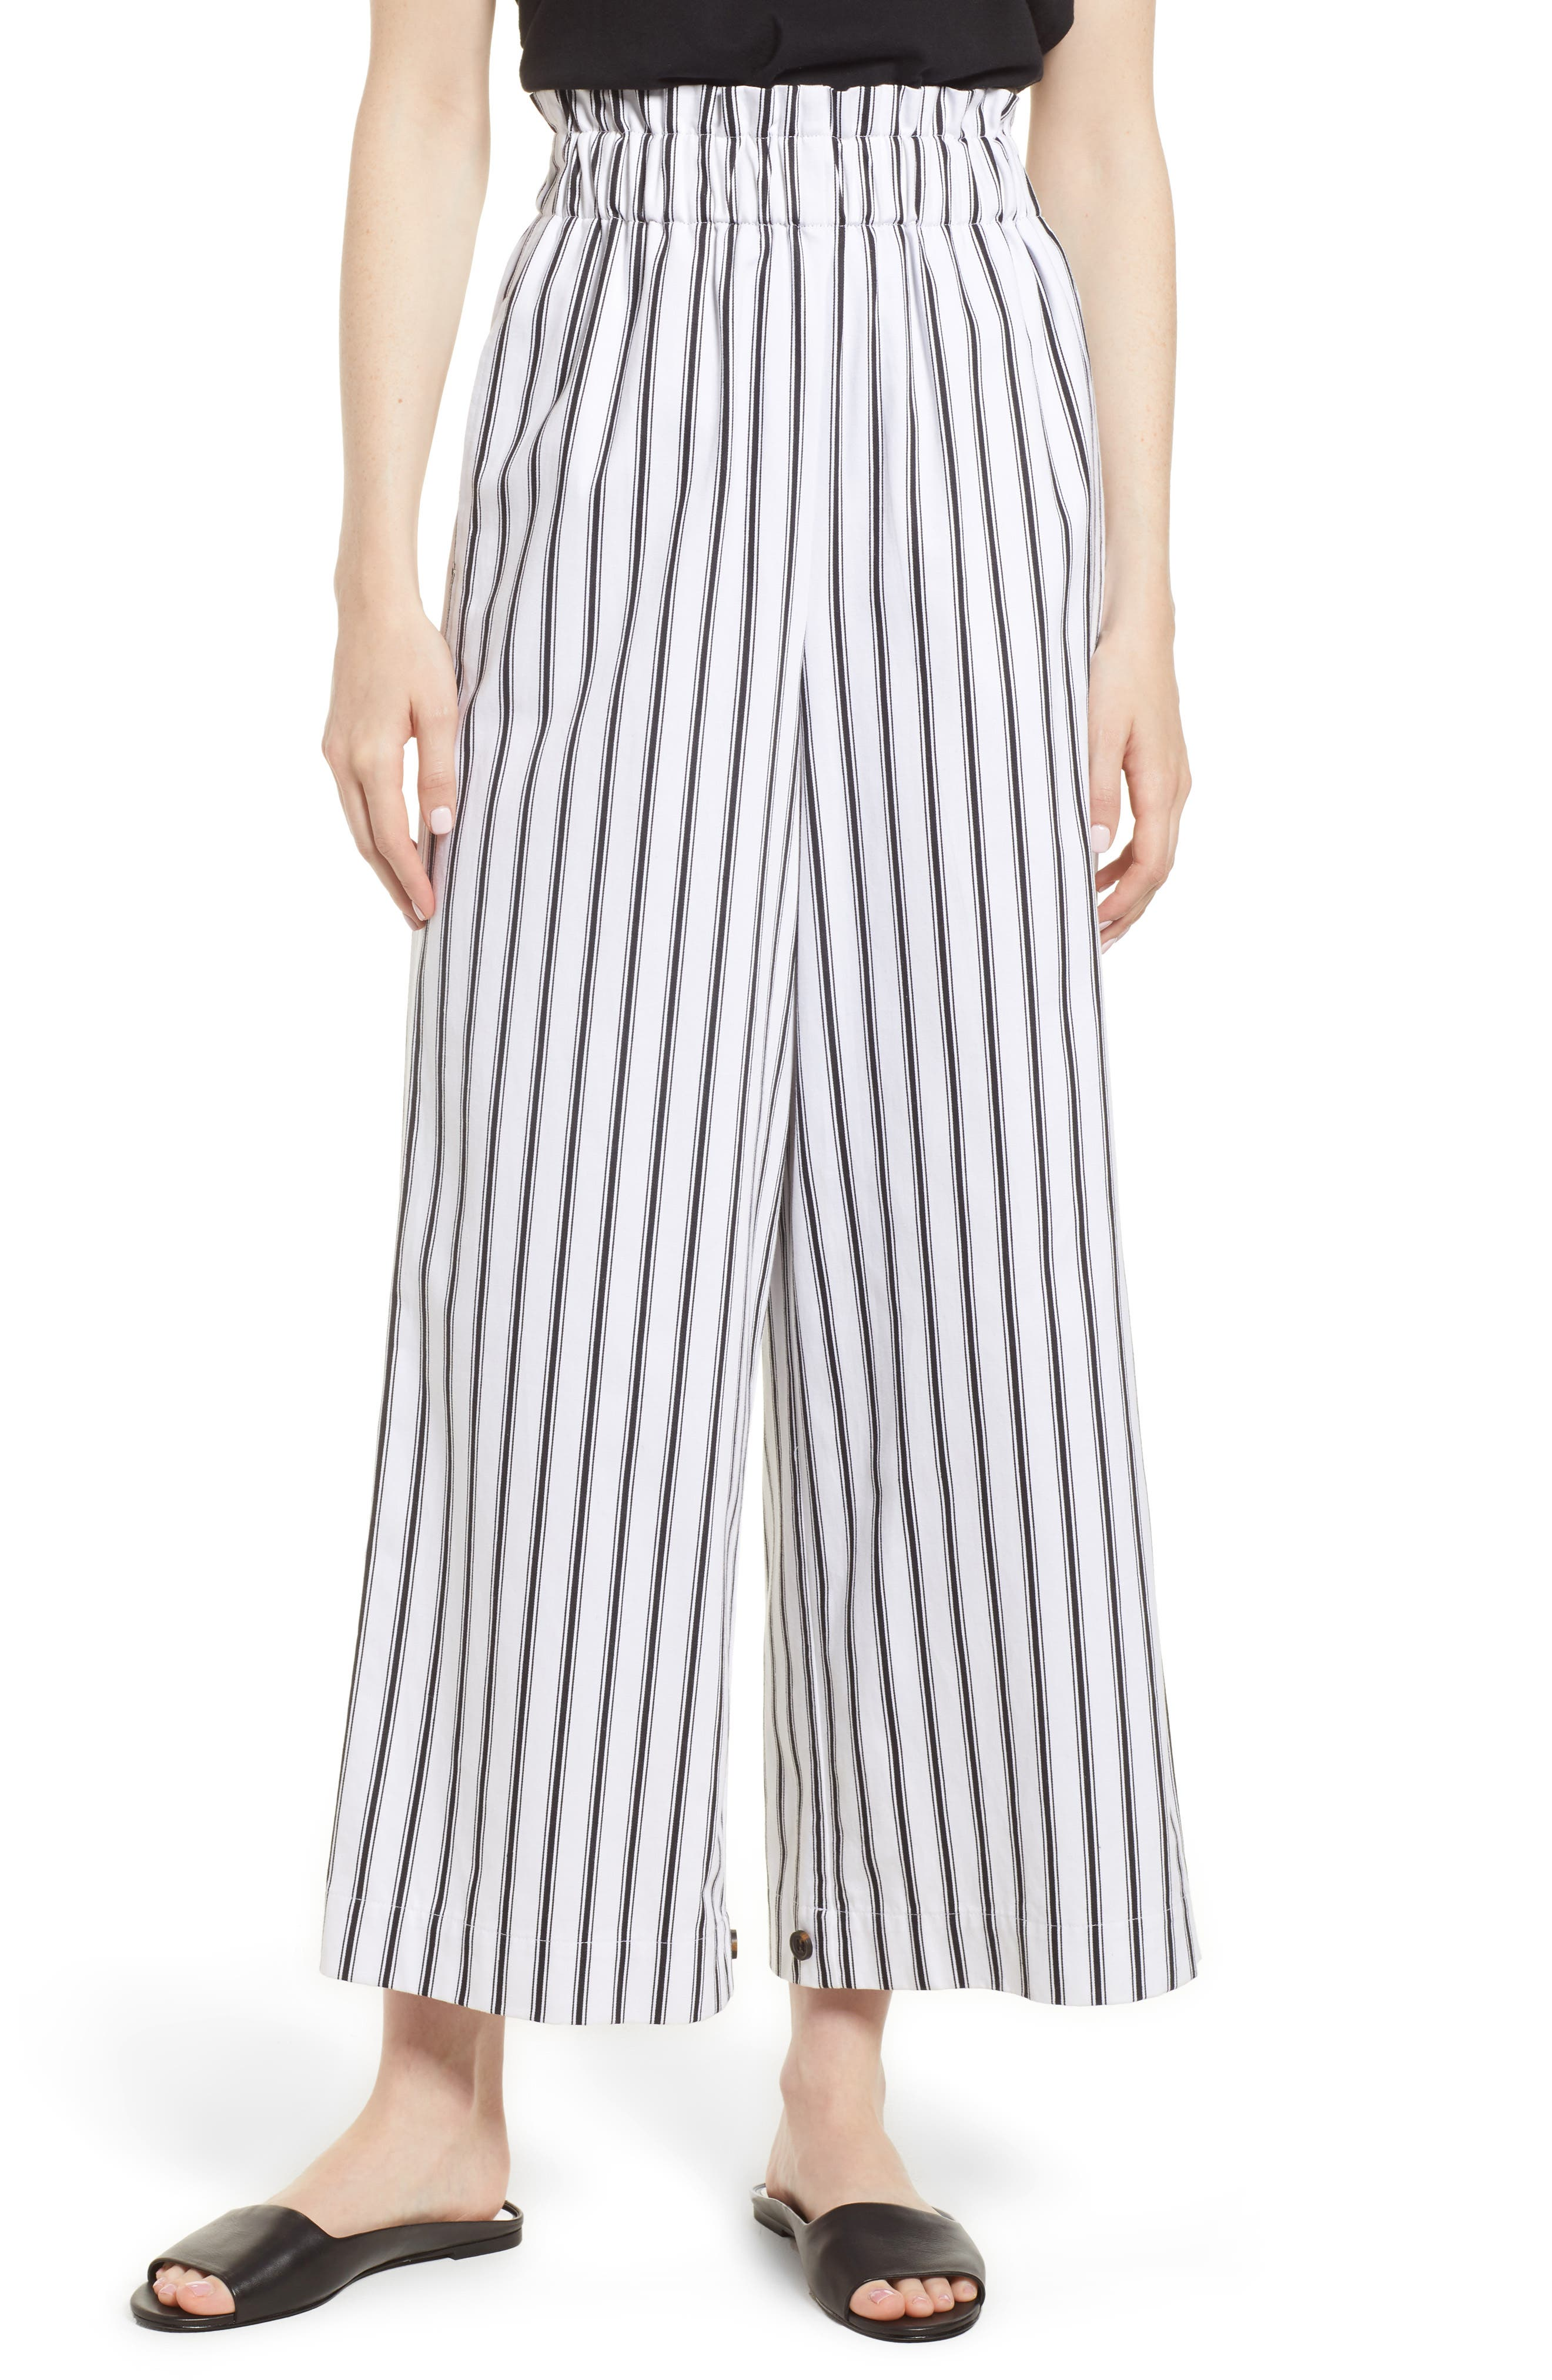 High Waist Convertible Wide Leg Pants,                             Alternate thumbnail 4, color,                             Black/ White Striped